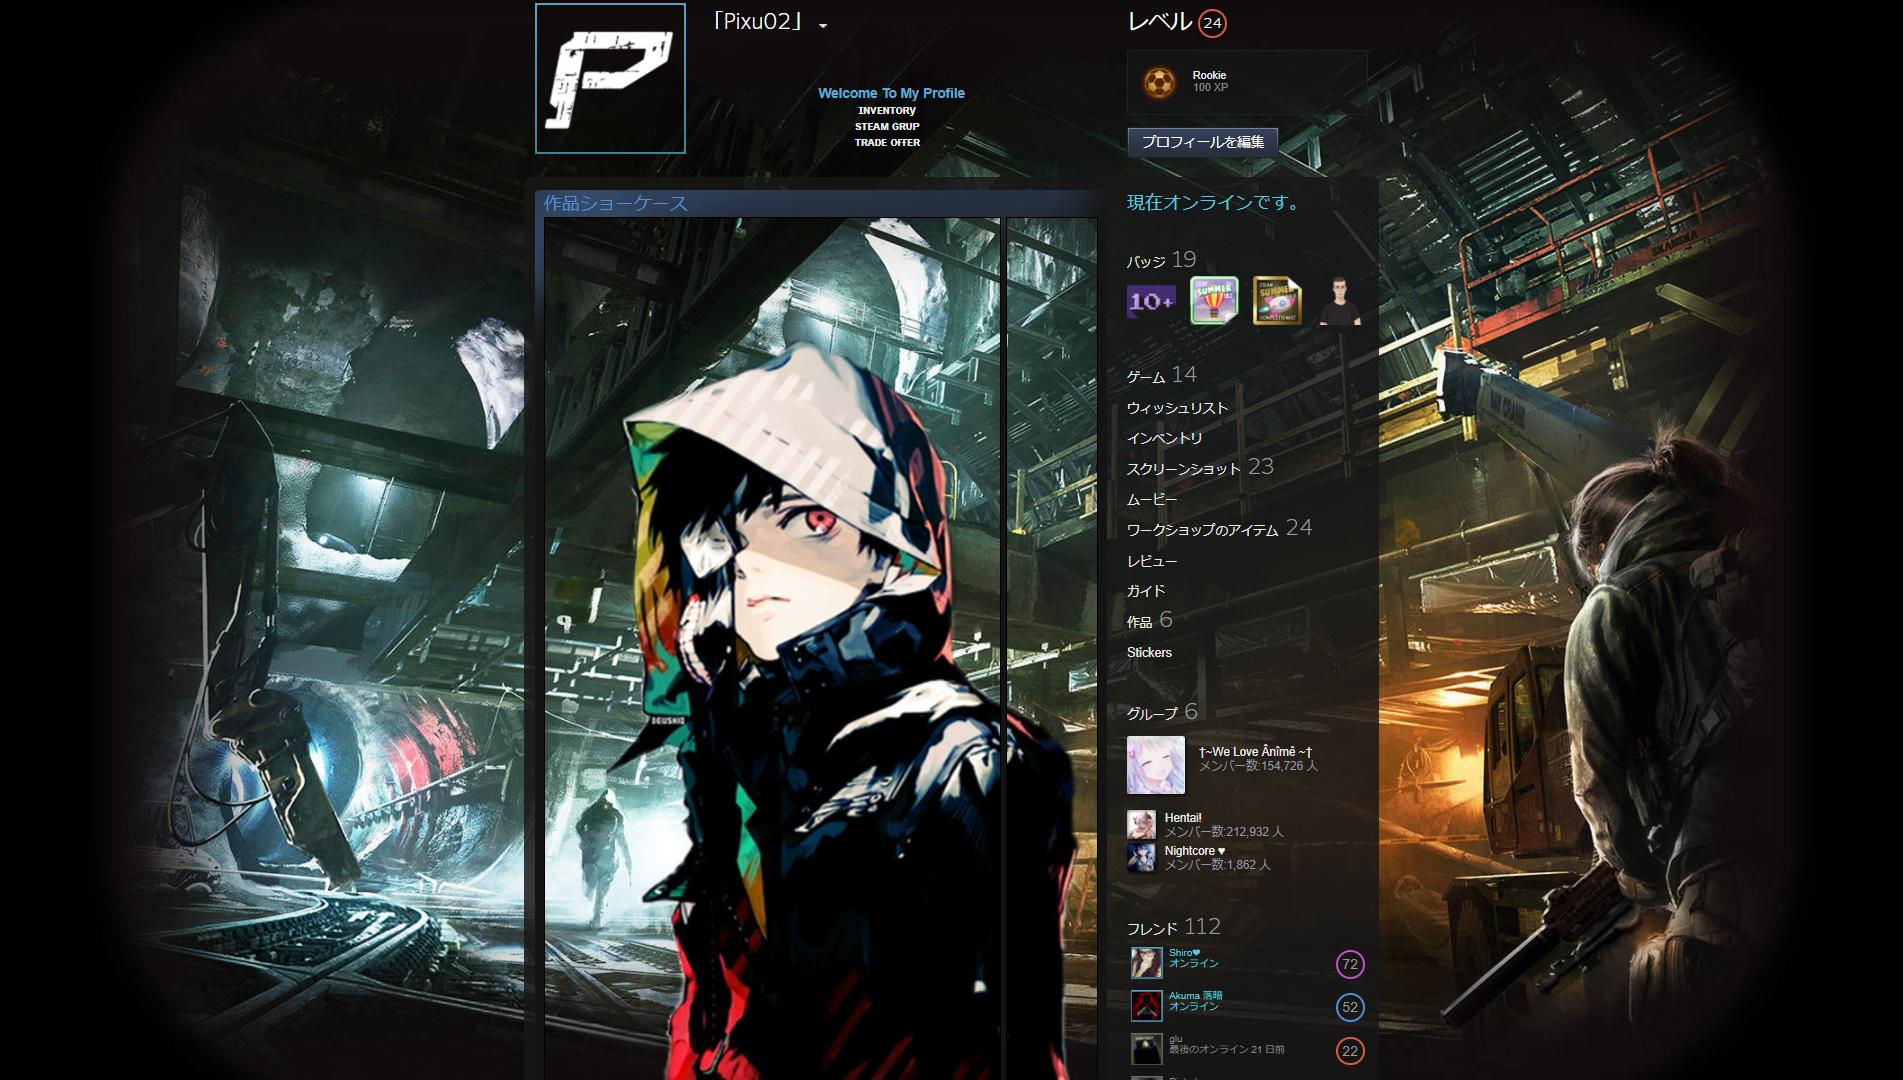 Tokyo Ghoul Kaneki Steam Profile Design By Pixu02 On Deviantart